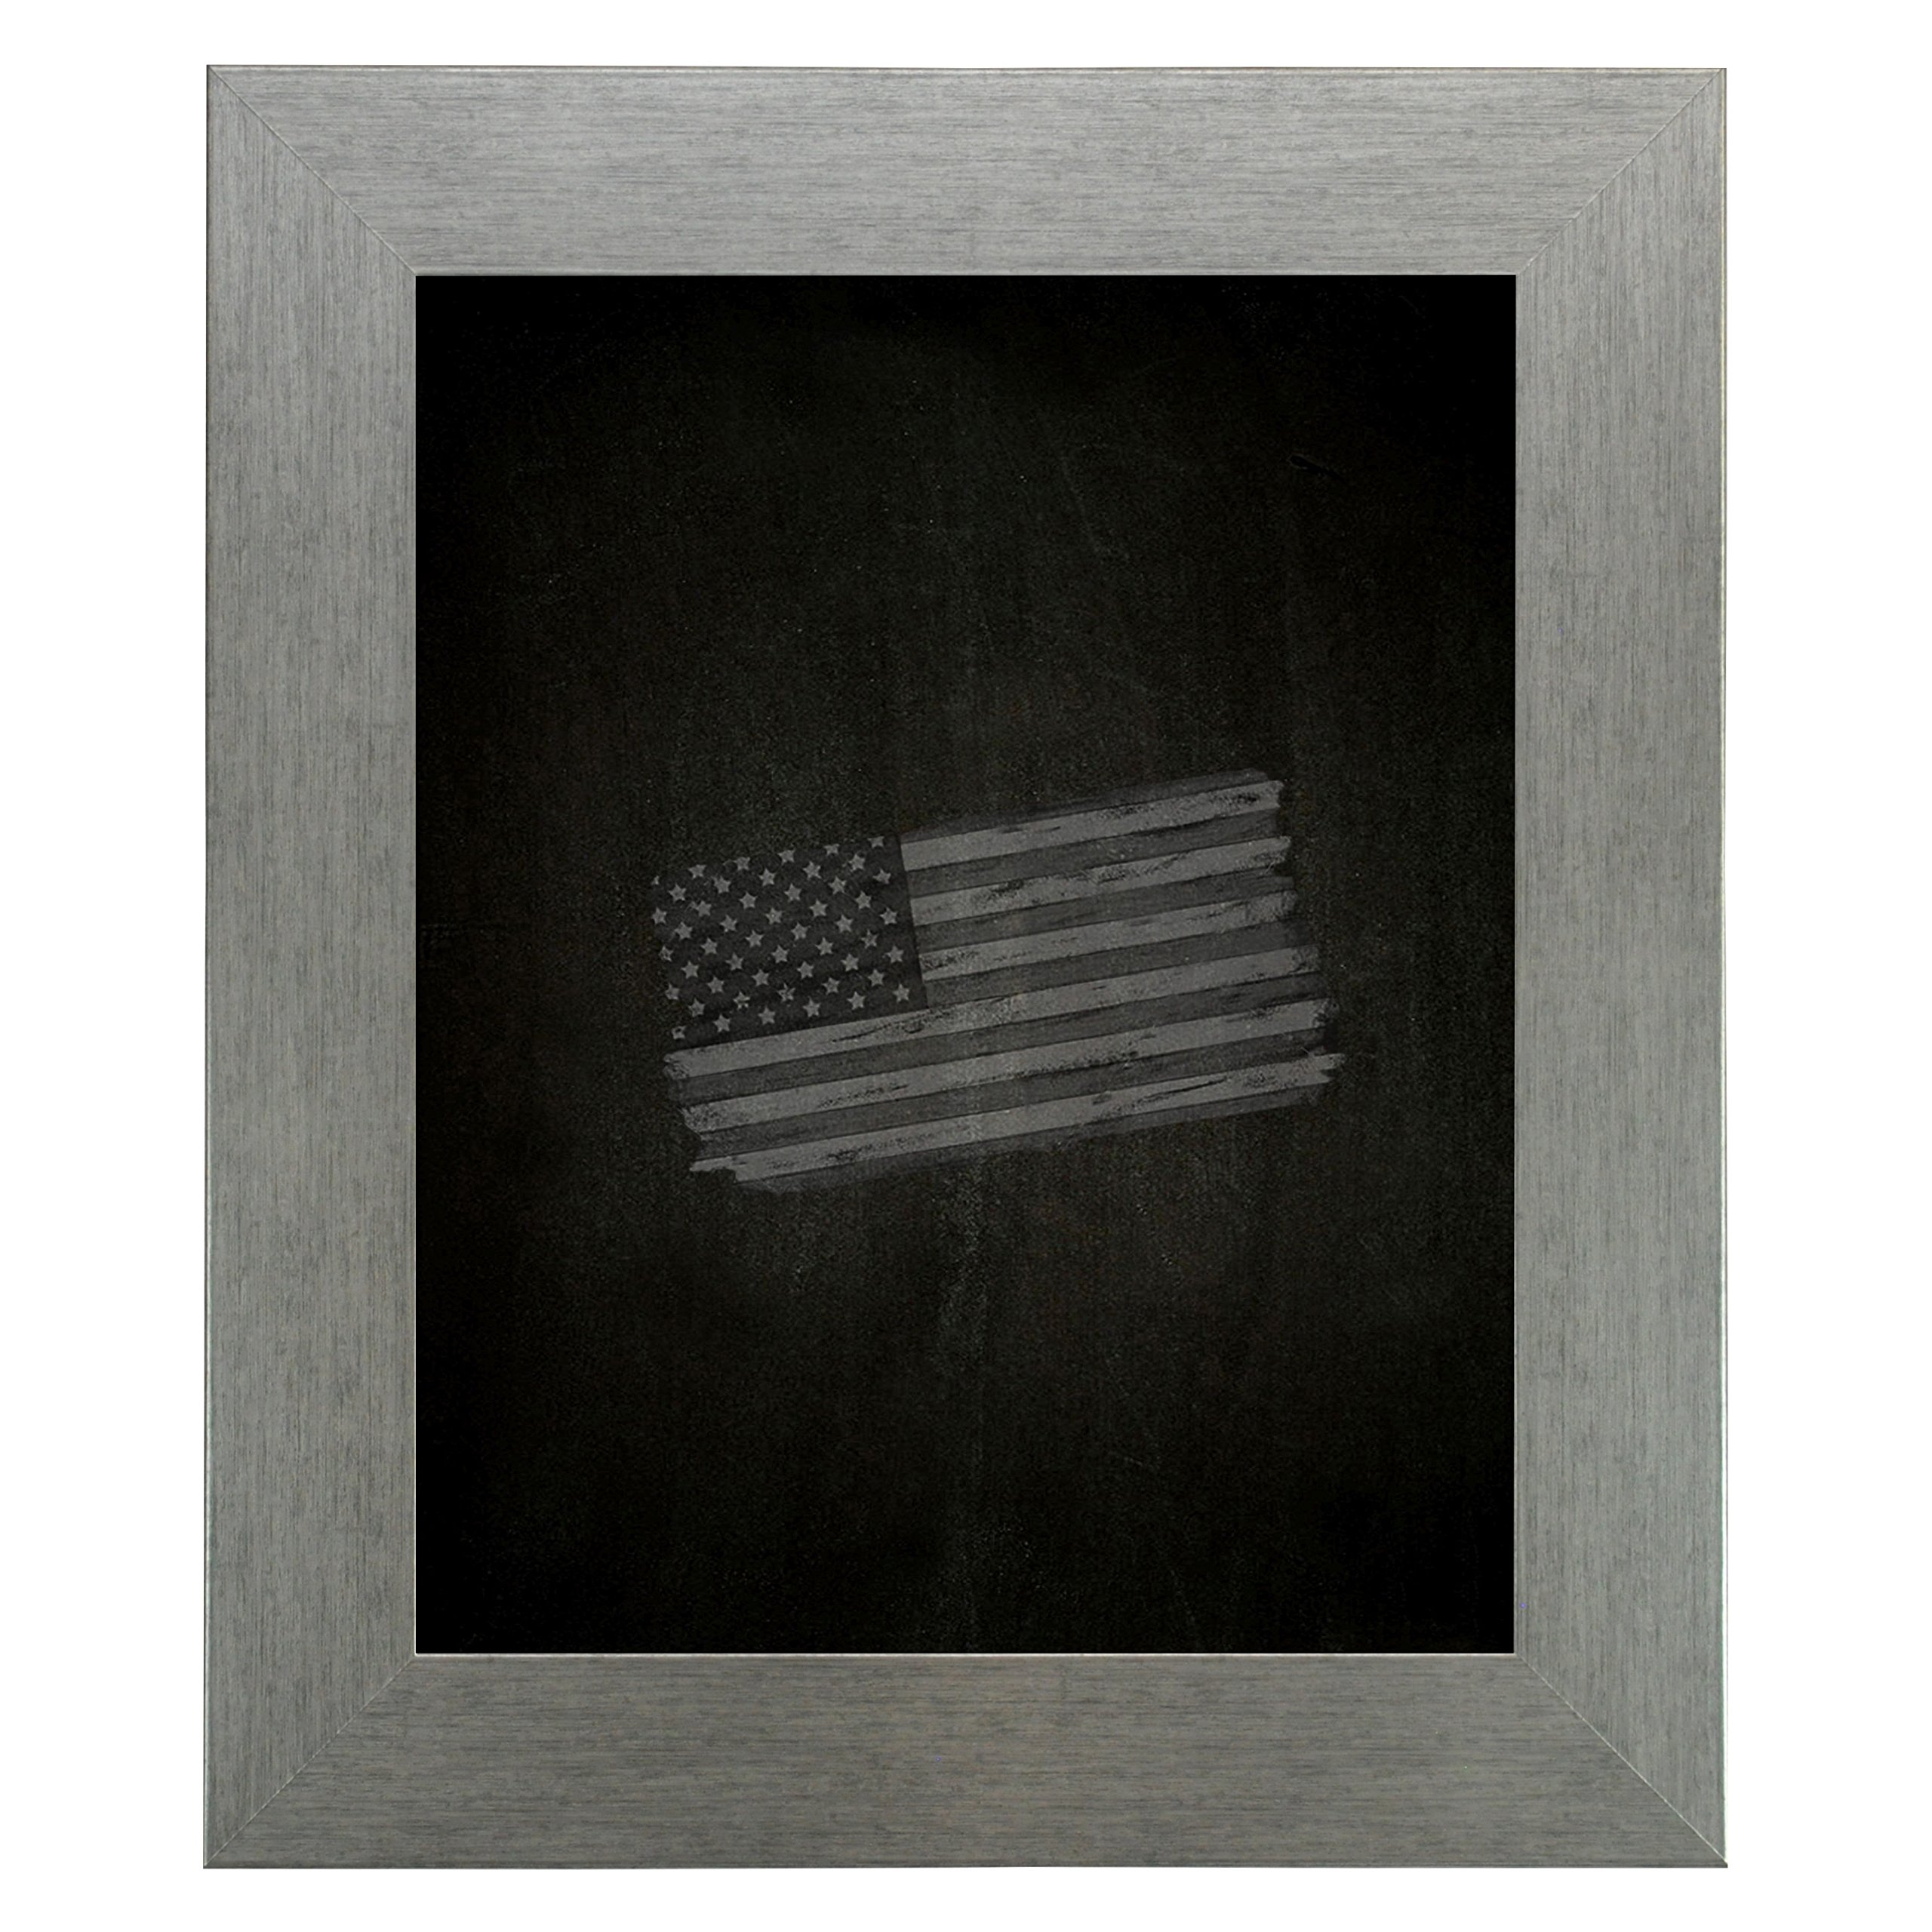 Rayne Mirrors American Made Rayne Yukon Silver Blackboard/ Chalkboard Exterior Size: 24 x 48 by Rayne Mirrors